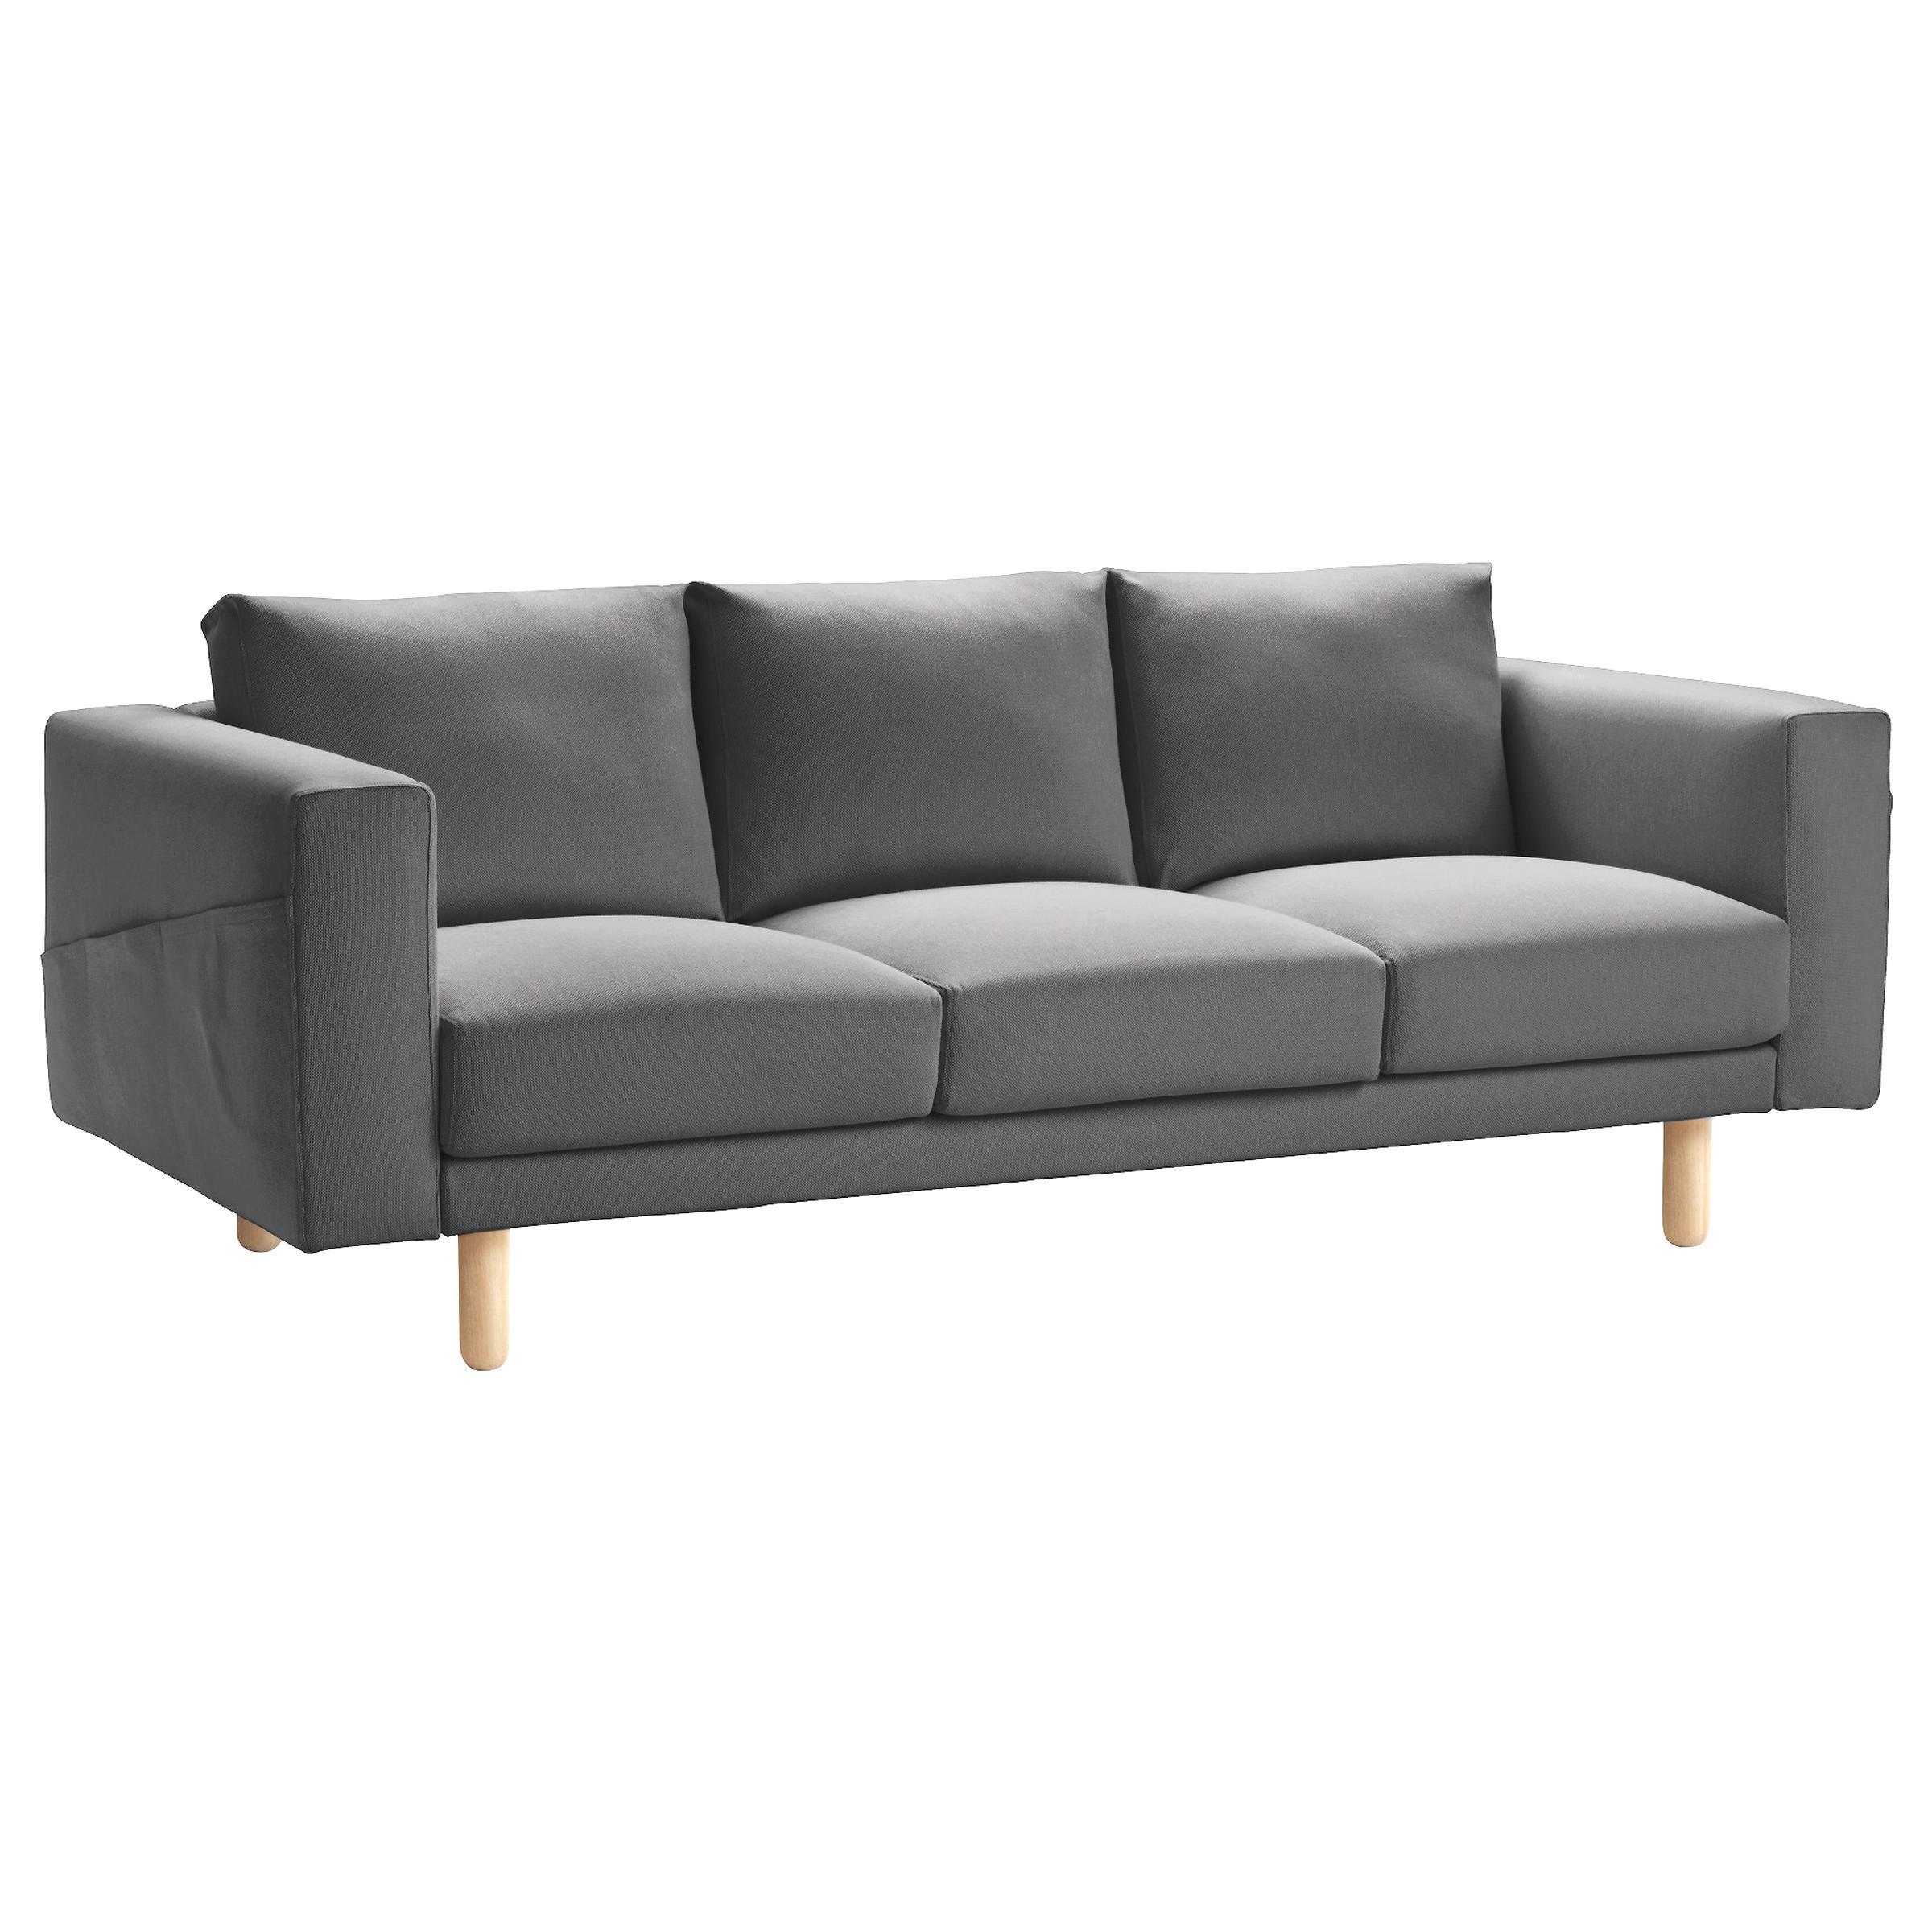 Full Size of Sofa 3 Sitzer Barock Poco Big Microfaser Kolonialstil Mit Relaxfunktion Chesterfield Günstig L Form Billig Schlaffunktion Grau Lagerverkauf Sofa Sofa 3 Sitzer